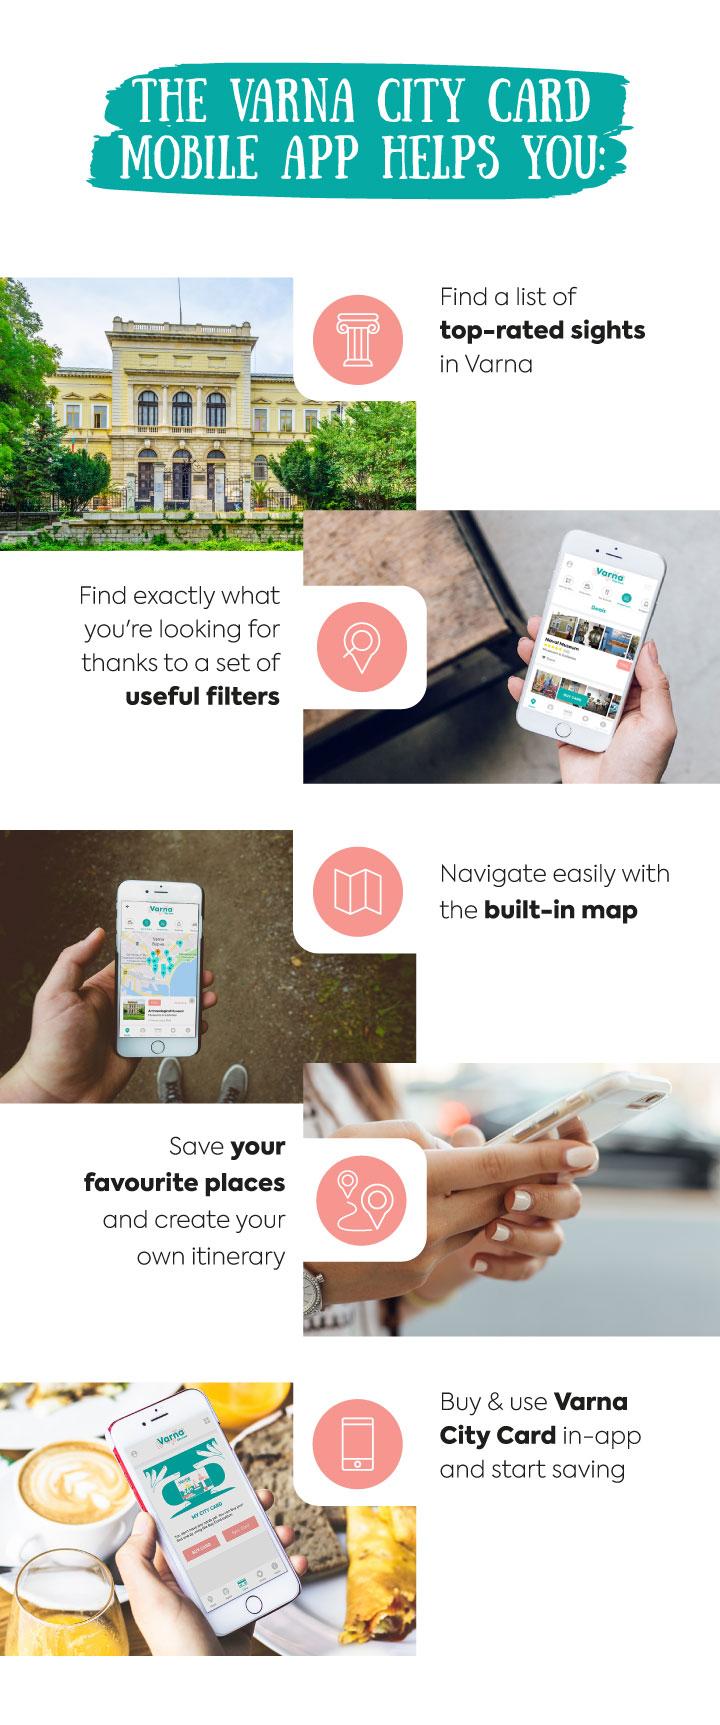 eng-free-varna-city-card-app-benefits